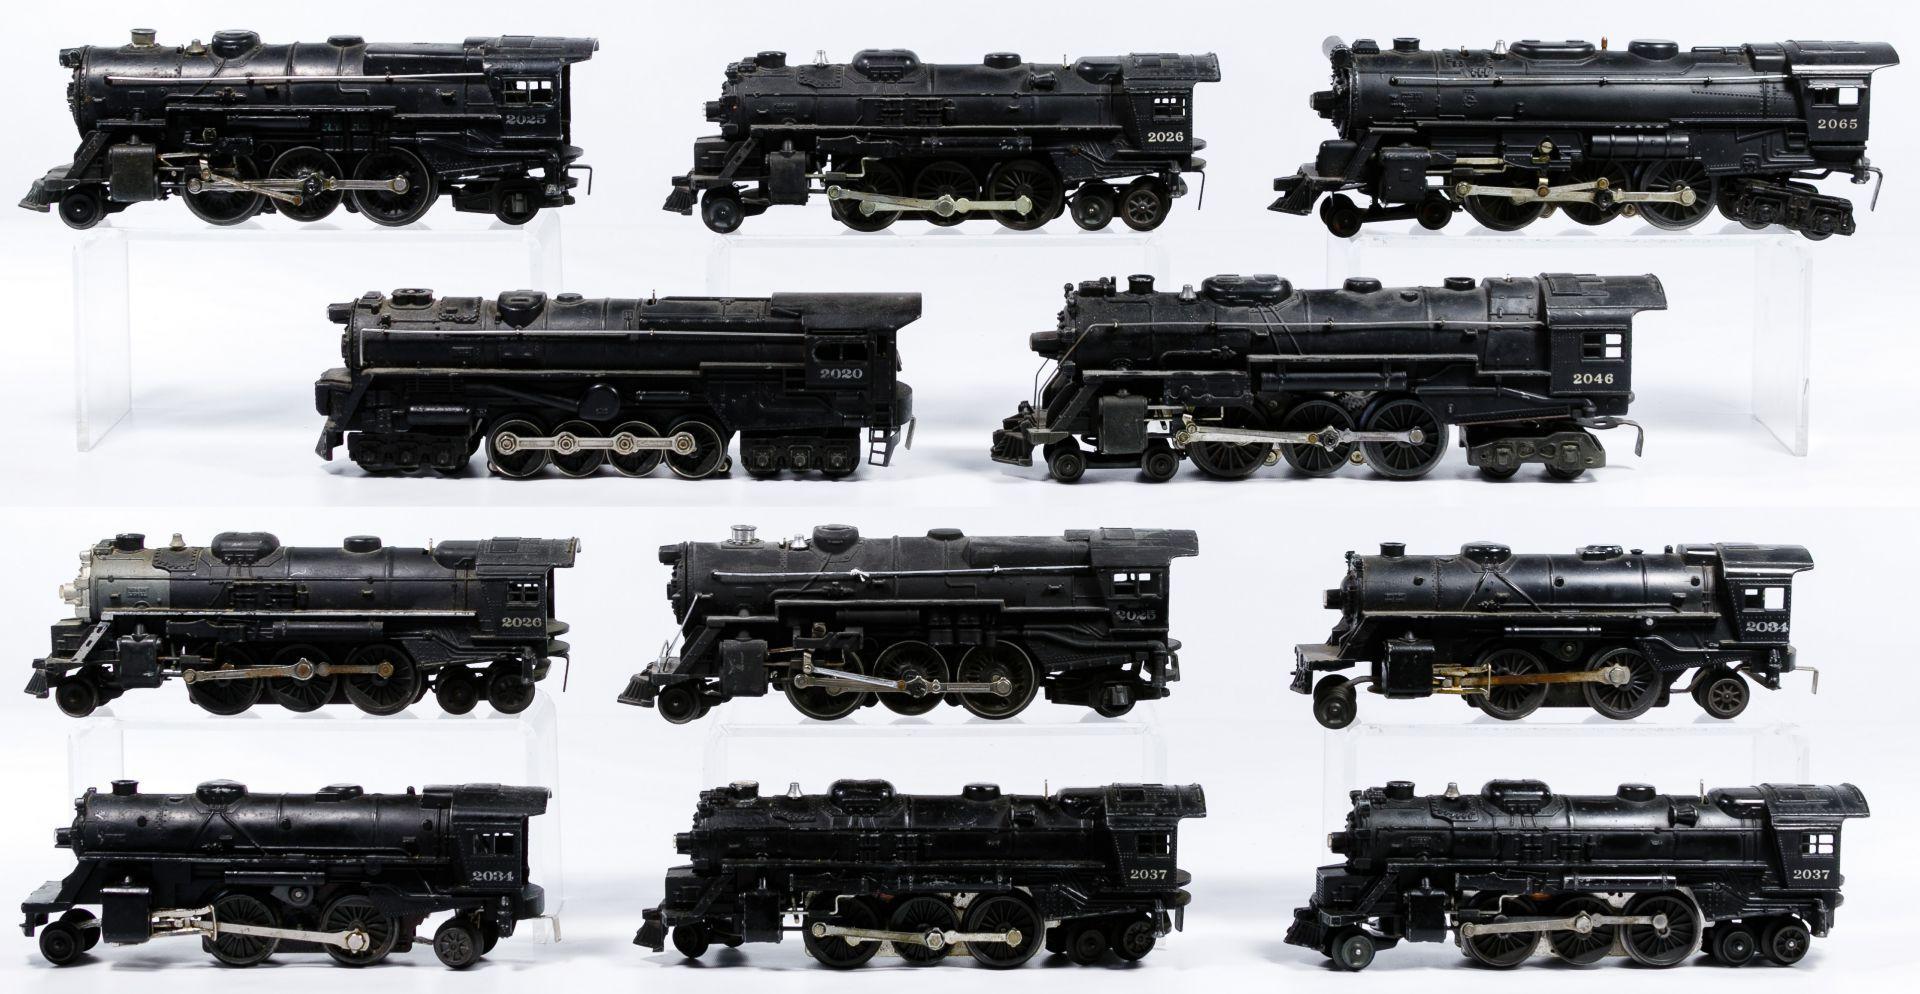 Lot 244: Lionel Model Train Locomotive Assortment; Eleven items including  #2020, two #2025, two #2026, two #2034, two #2037, #204…   Model trains,  Train, LocomotivePinterest